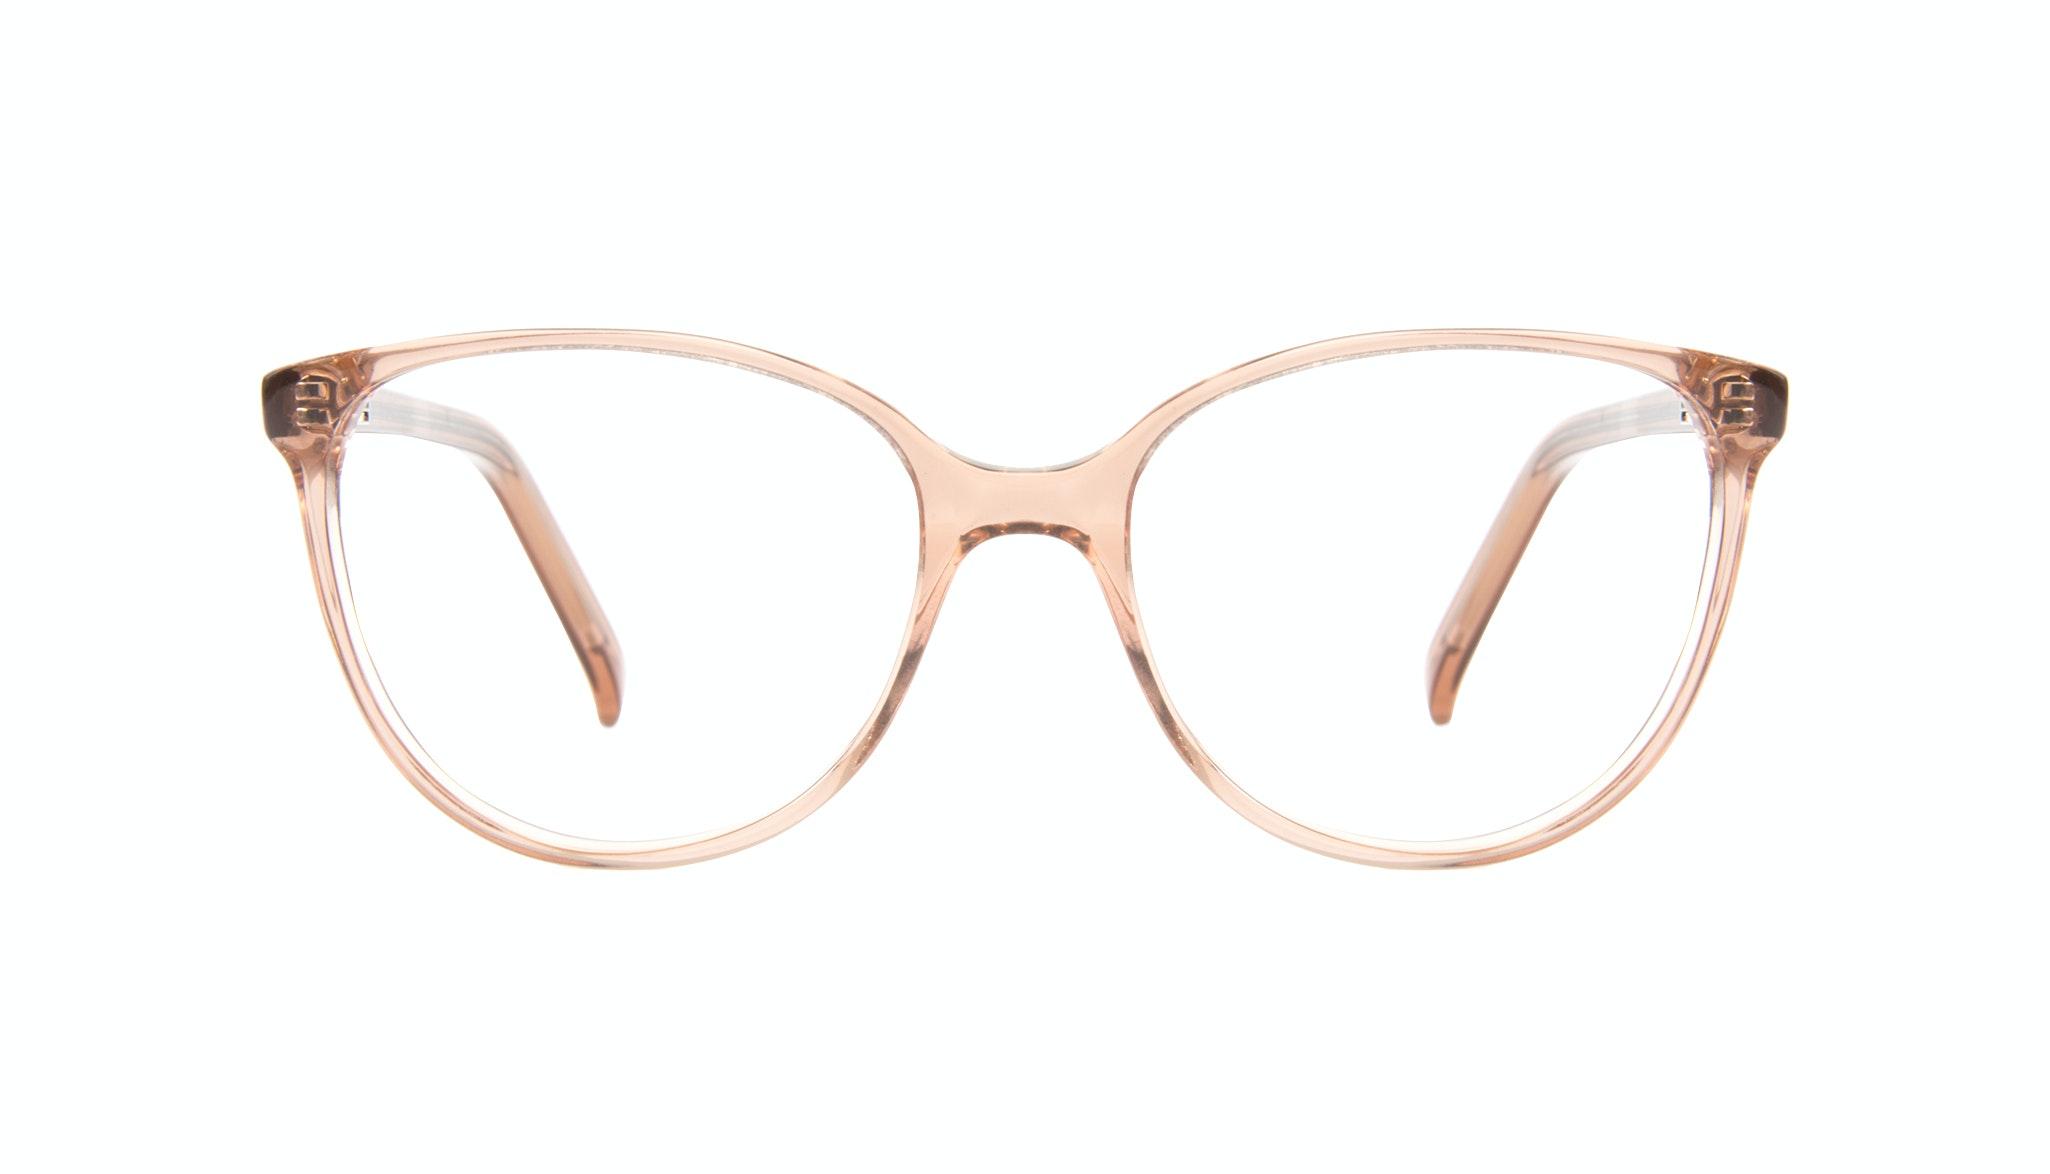 Affordable Fashion Glasses Cat Eye Eyeglasses Women Imagine Petite Rose Front